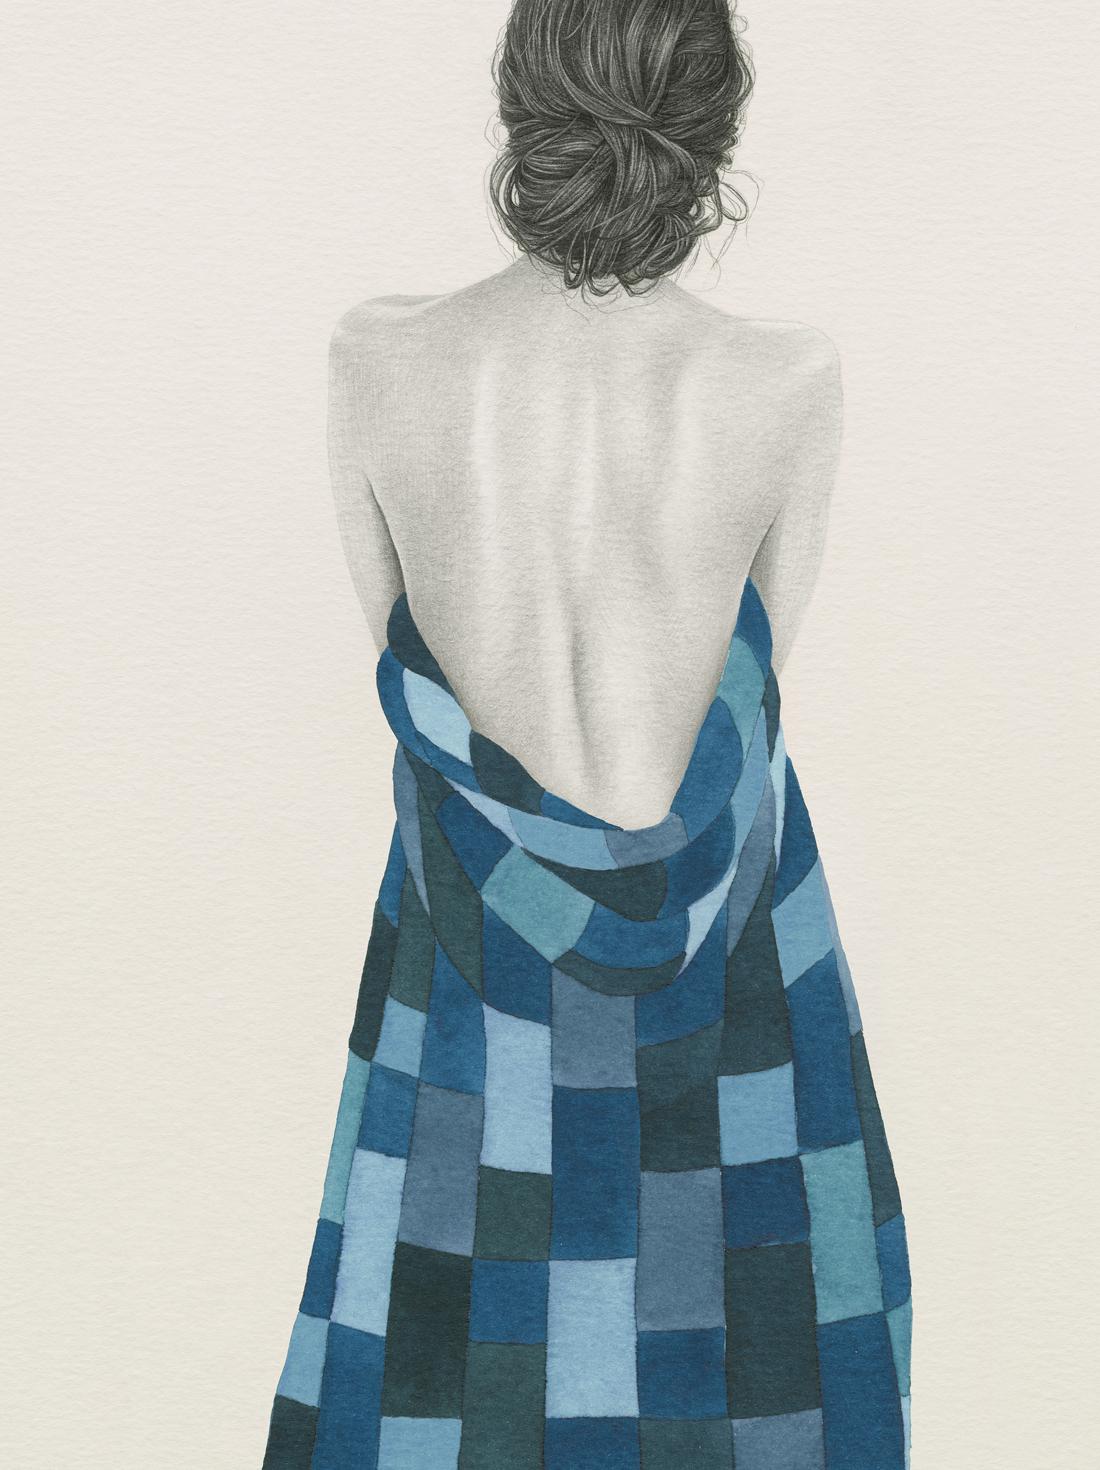 HELENA FRANK - Blue Patchwork